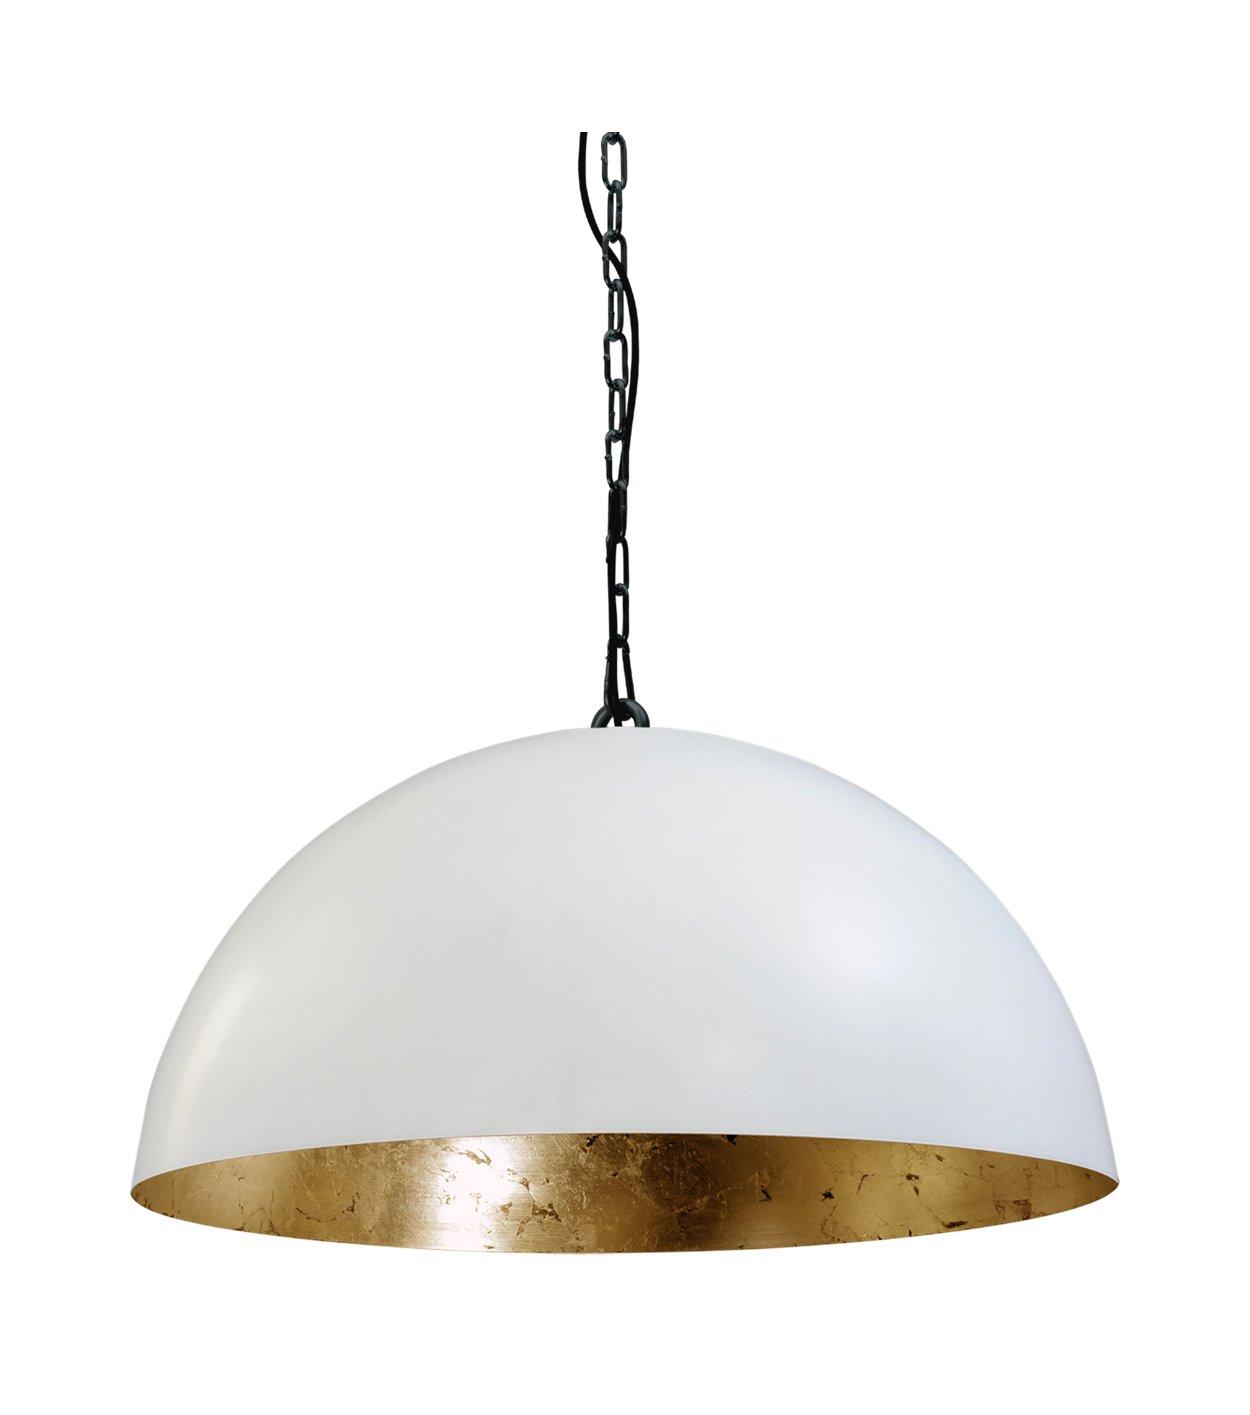 Masterlight Grote hanglamp Industria Gold 50 Masterlight 2197-06-08-K